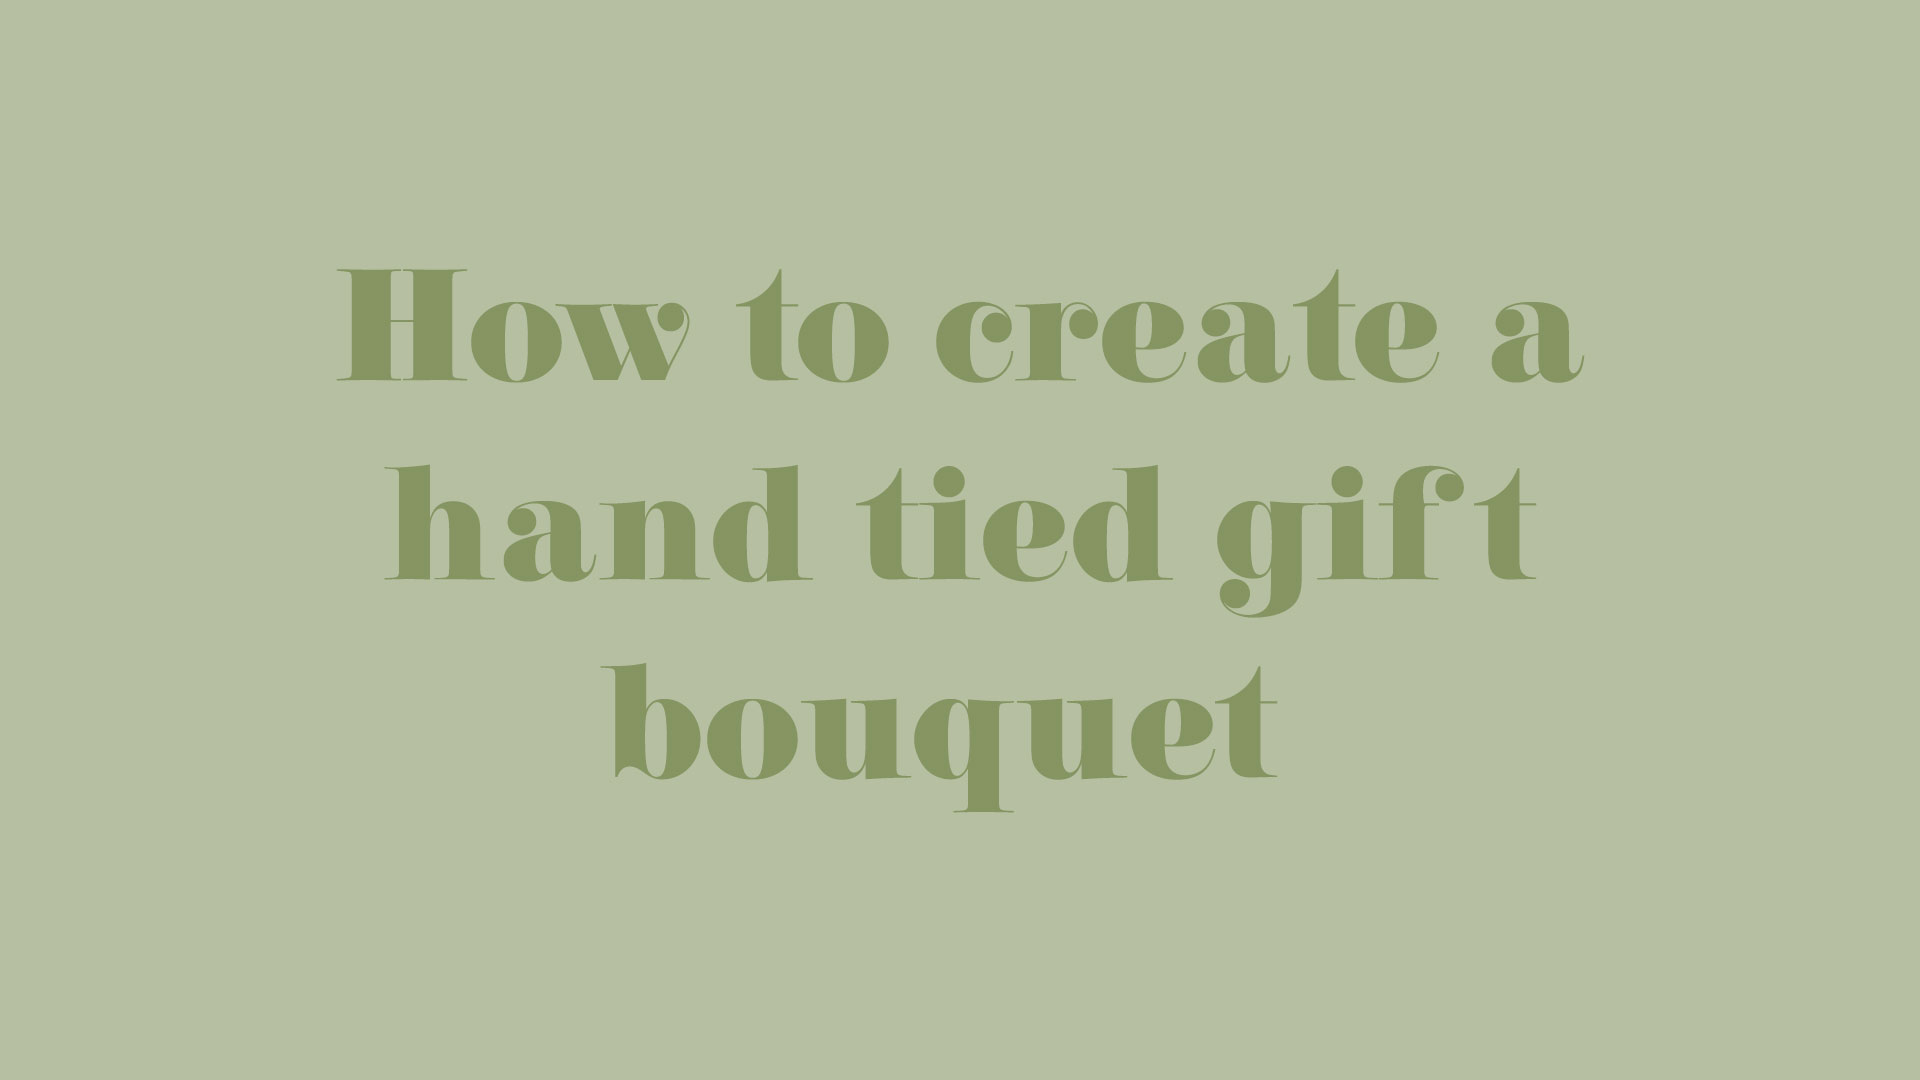 TitleCards-HowToCreateAHandTiedGiftBouquet.jpg